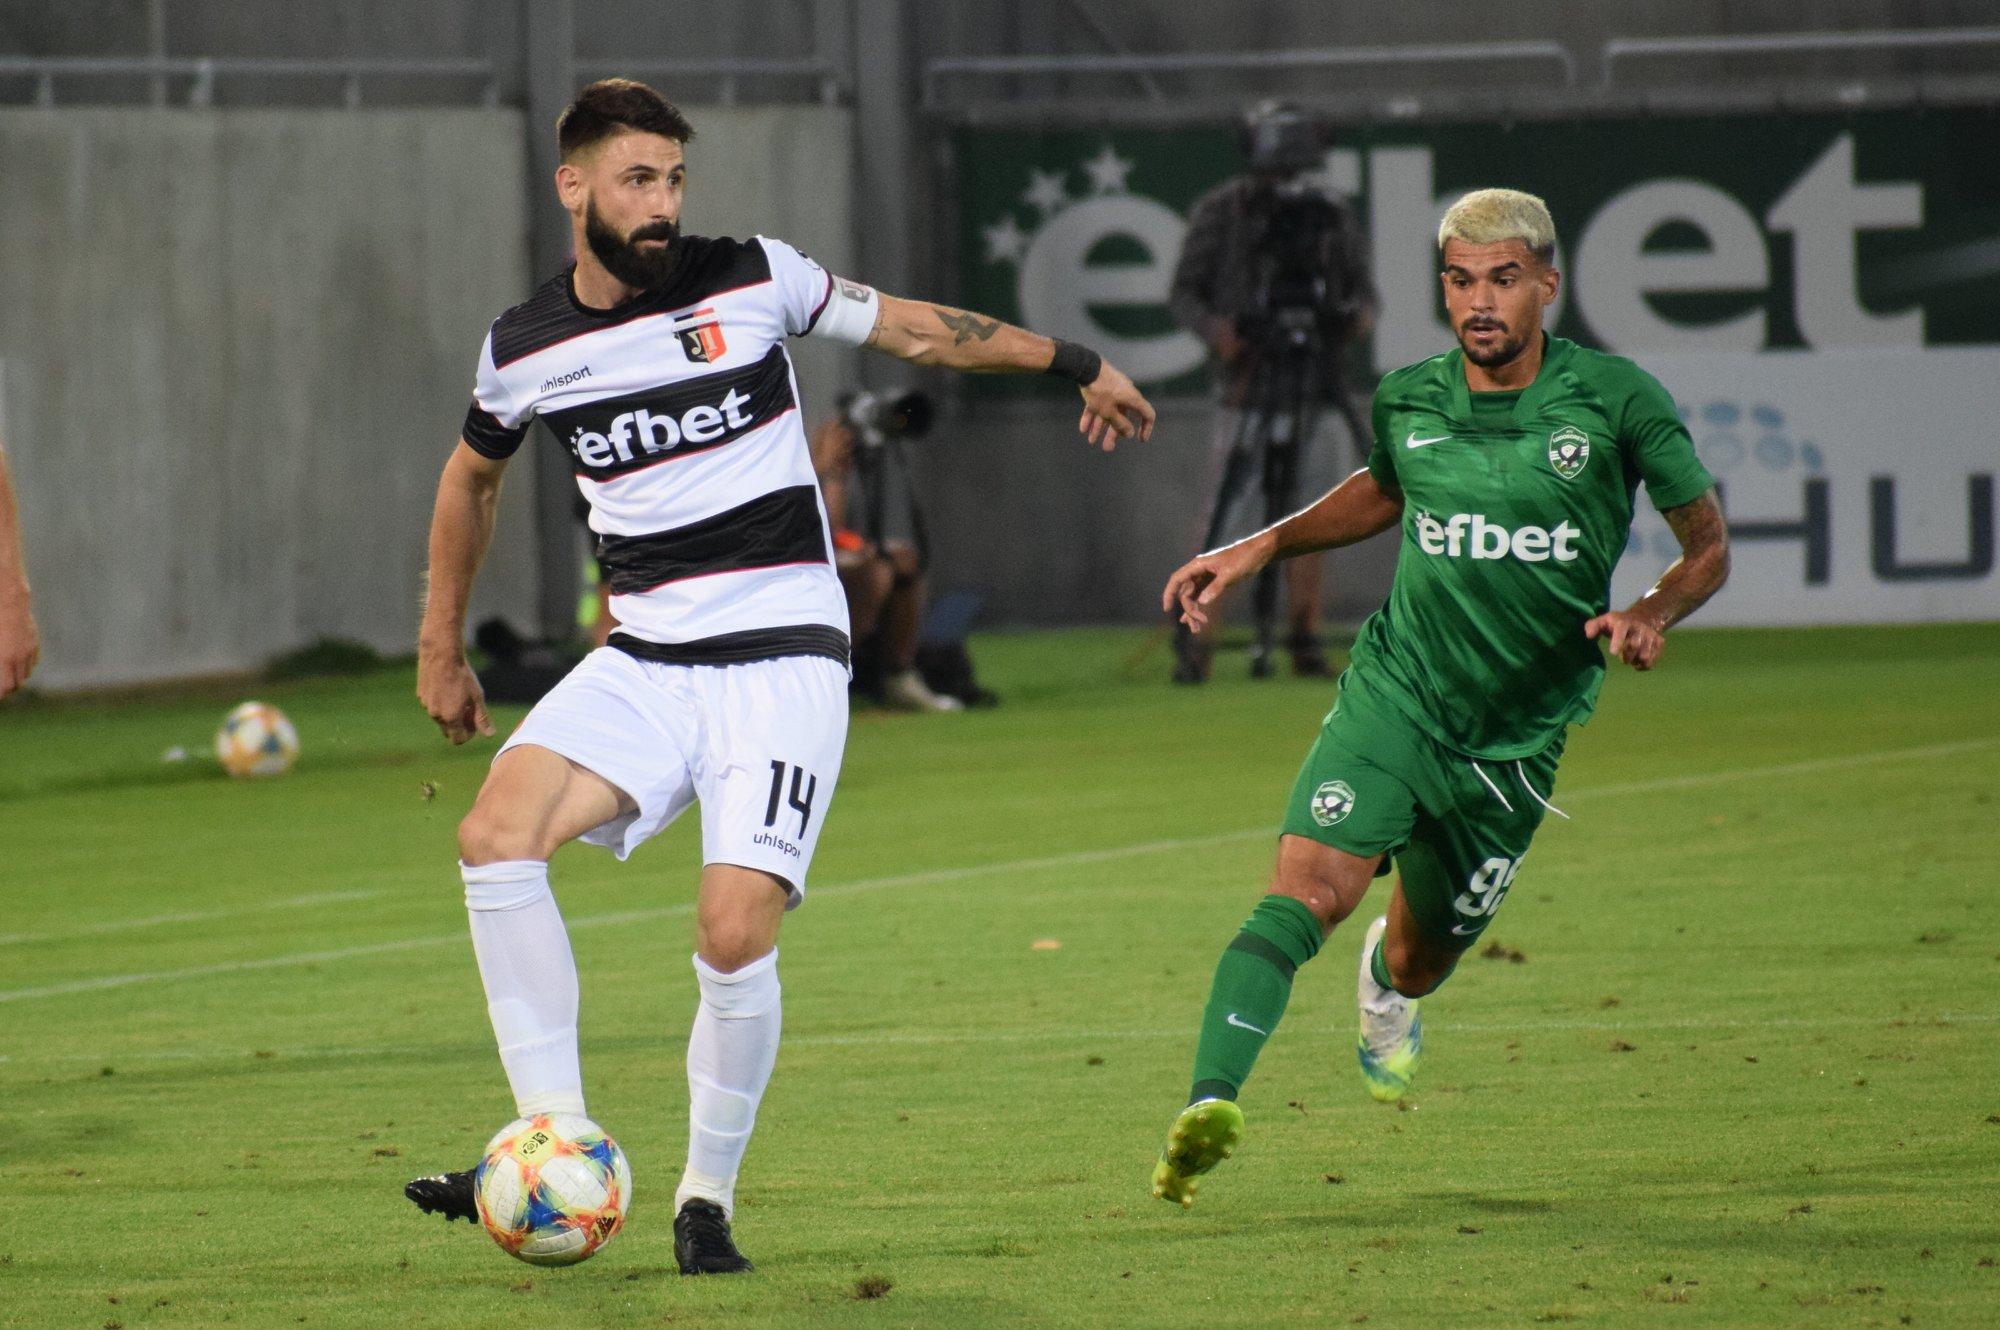 Митко Илиев донесе поредна Купа за Локомотив Пловдив 1